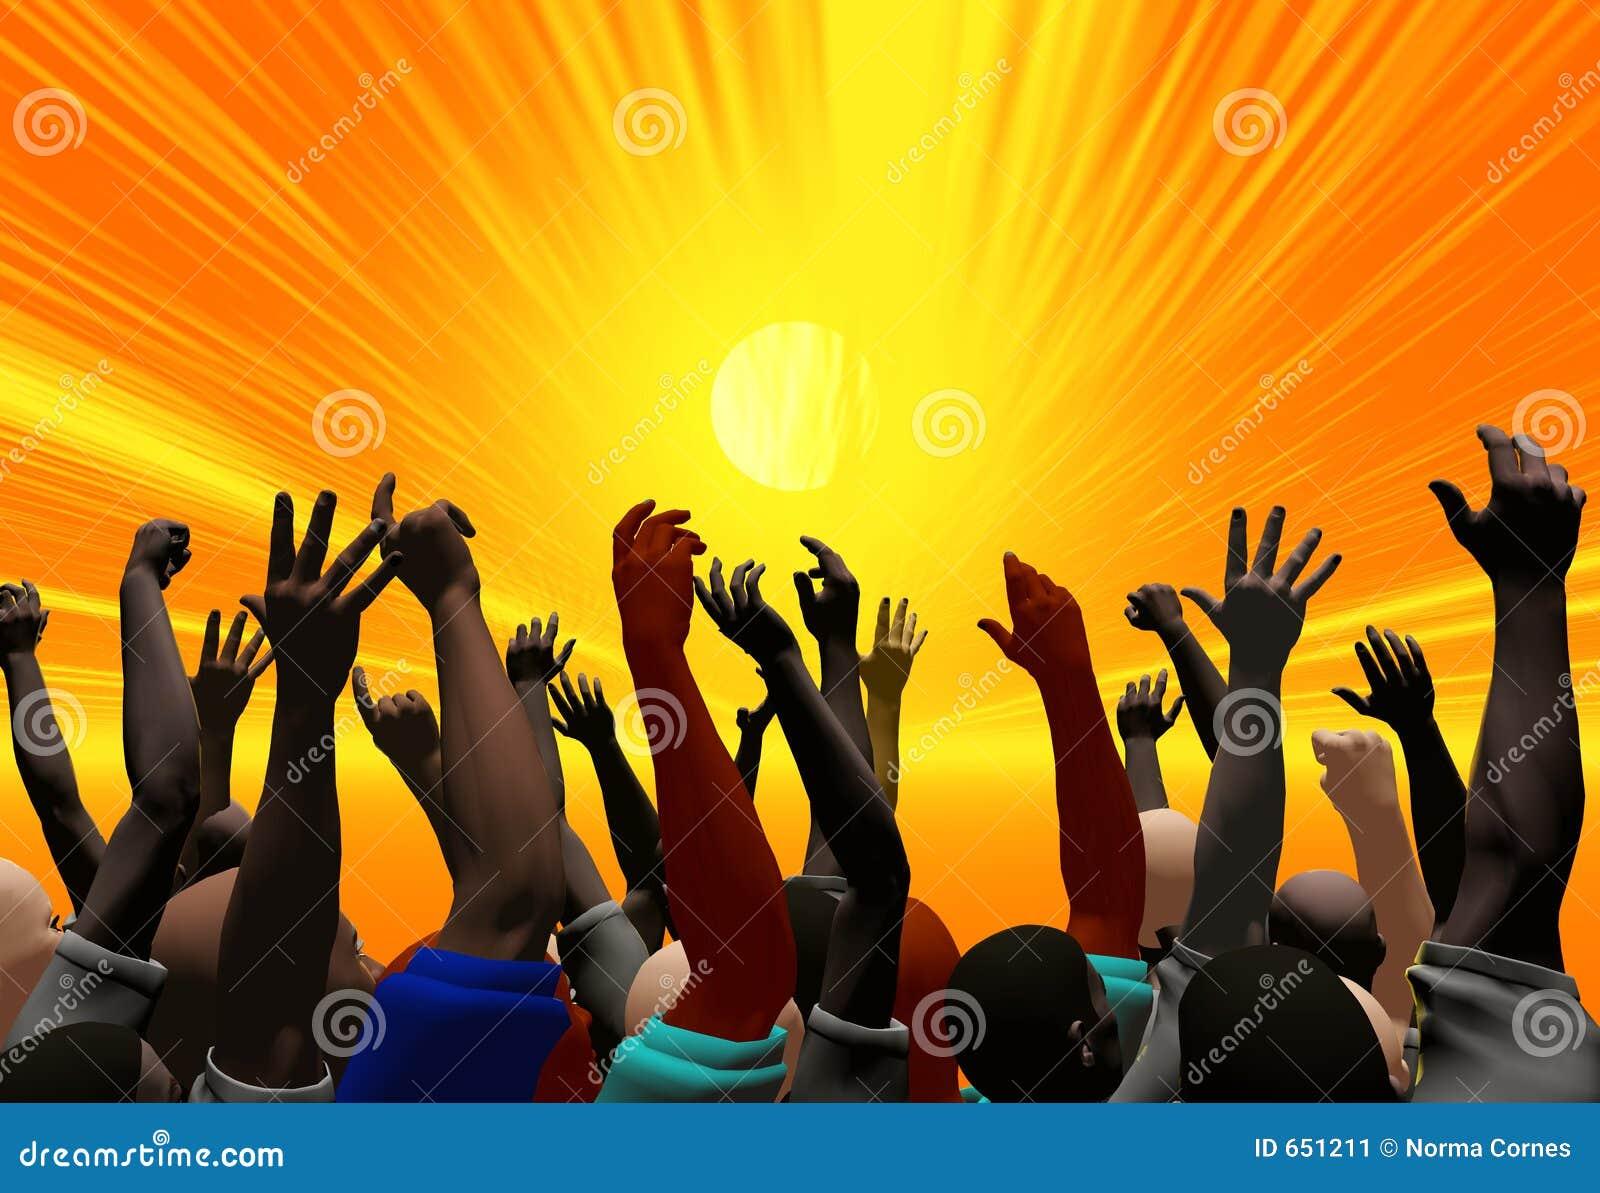 Applause Stock Image - Image: 651211